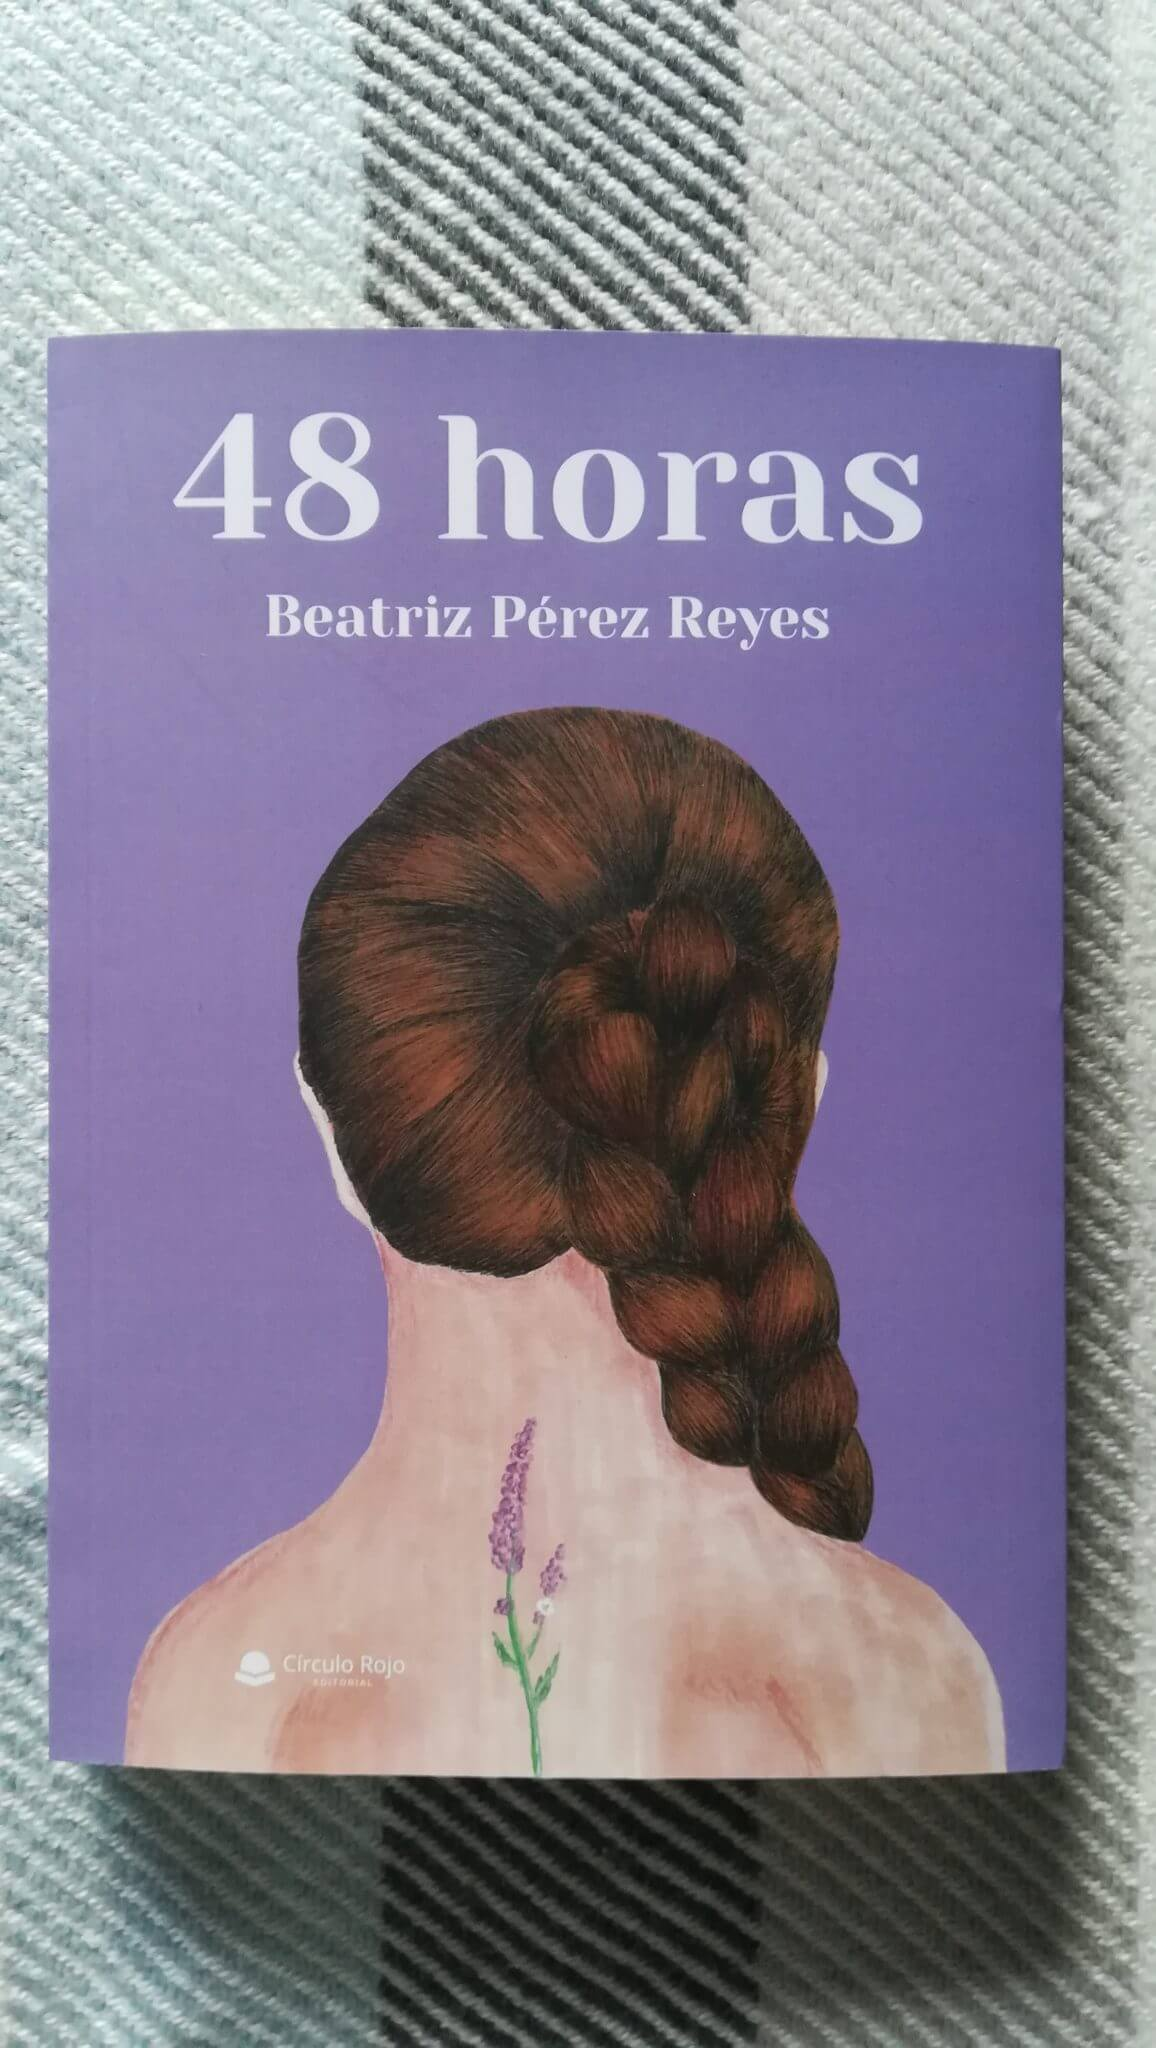 48 horas – Beatriz Pérez Reyes